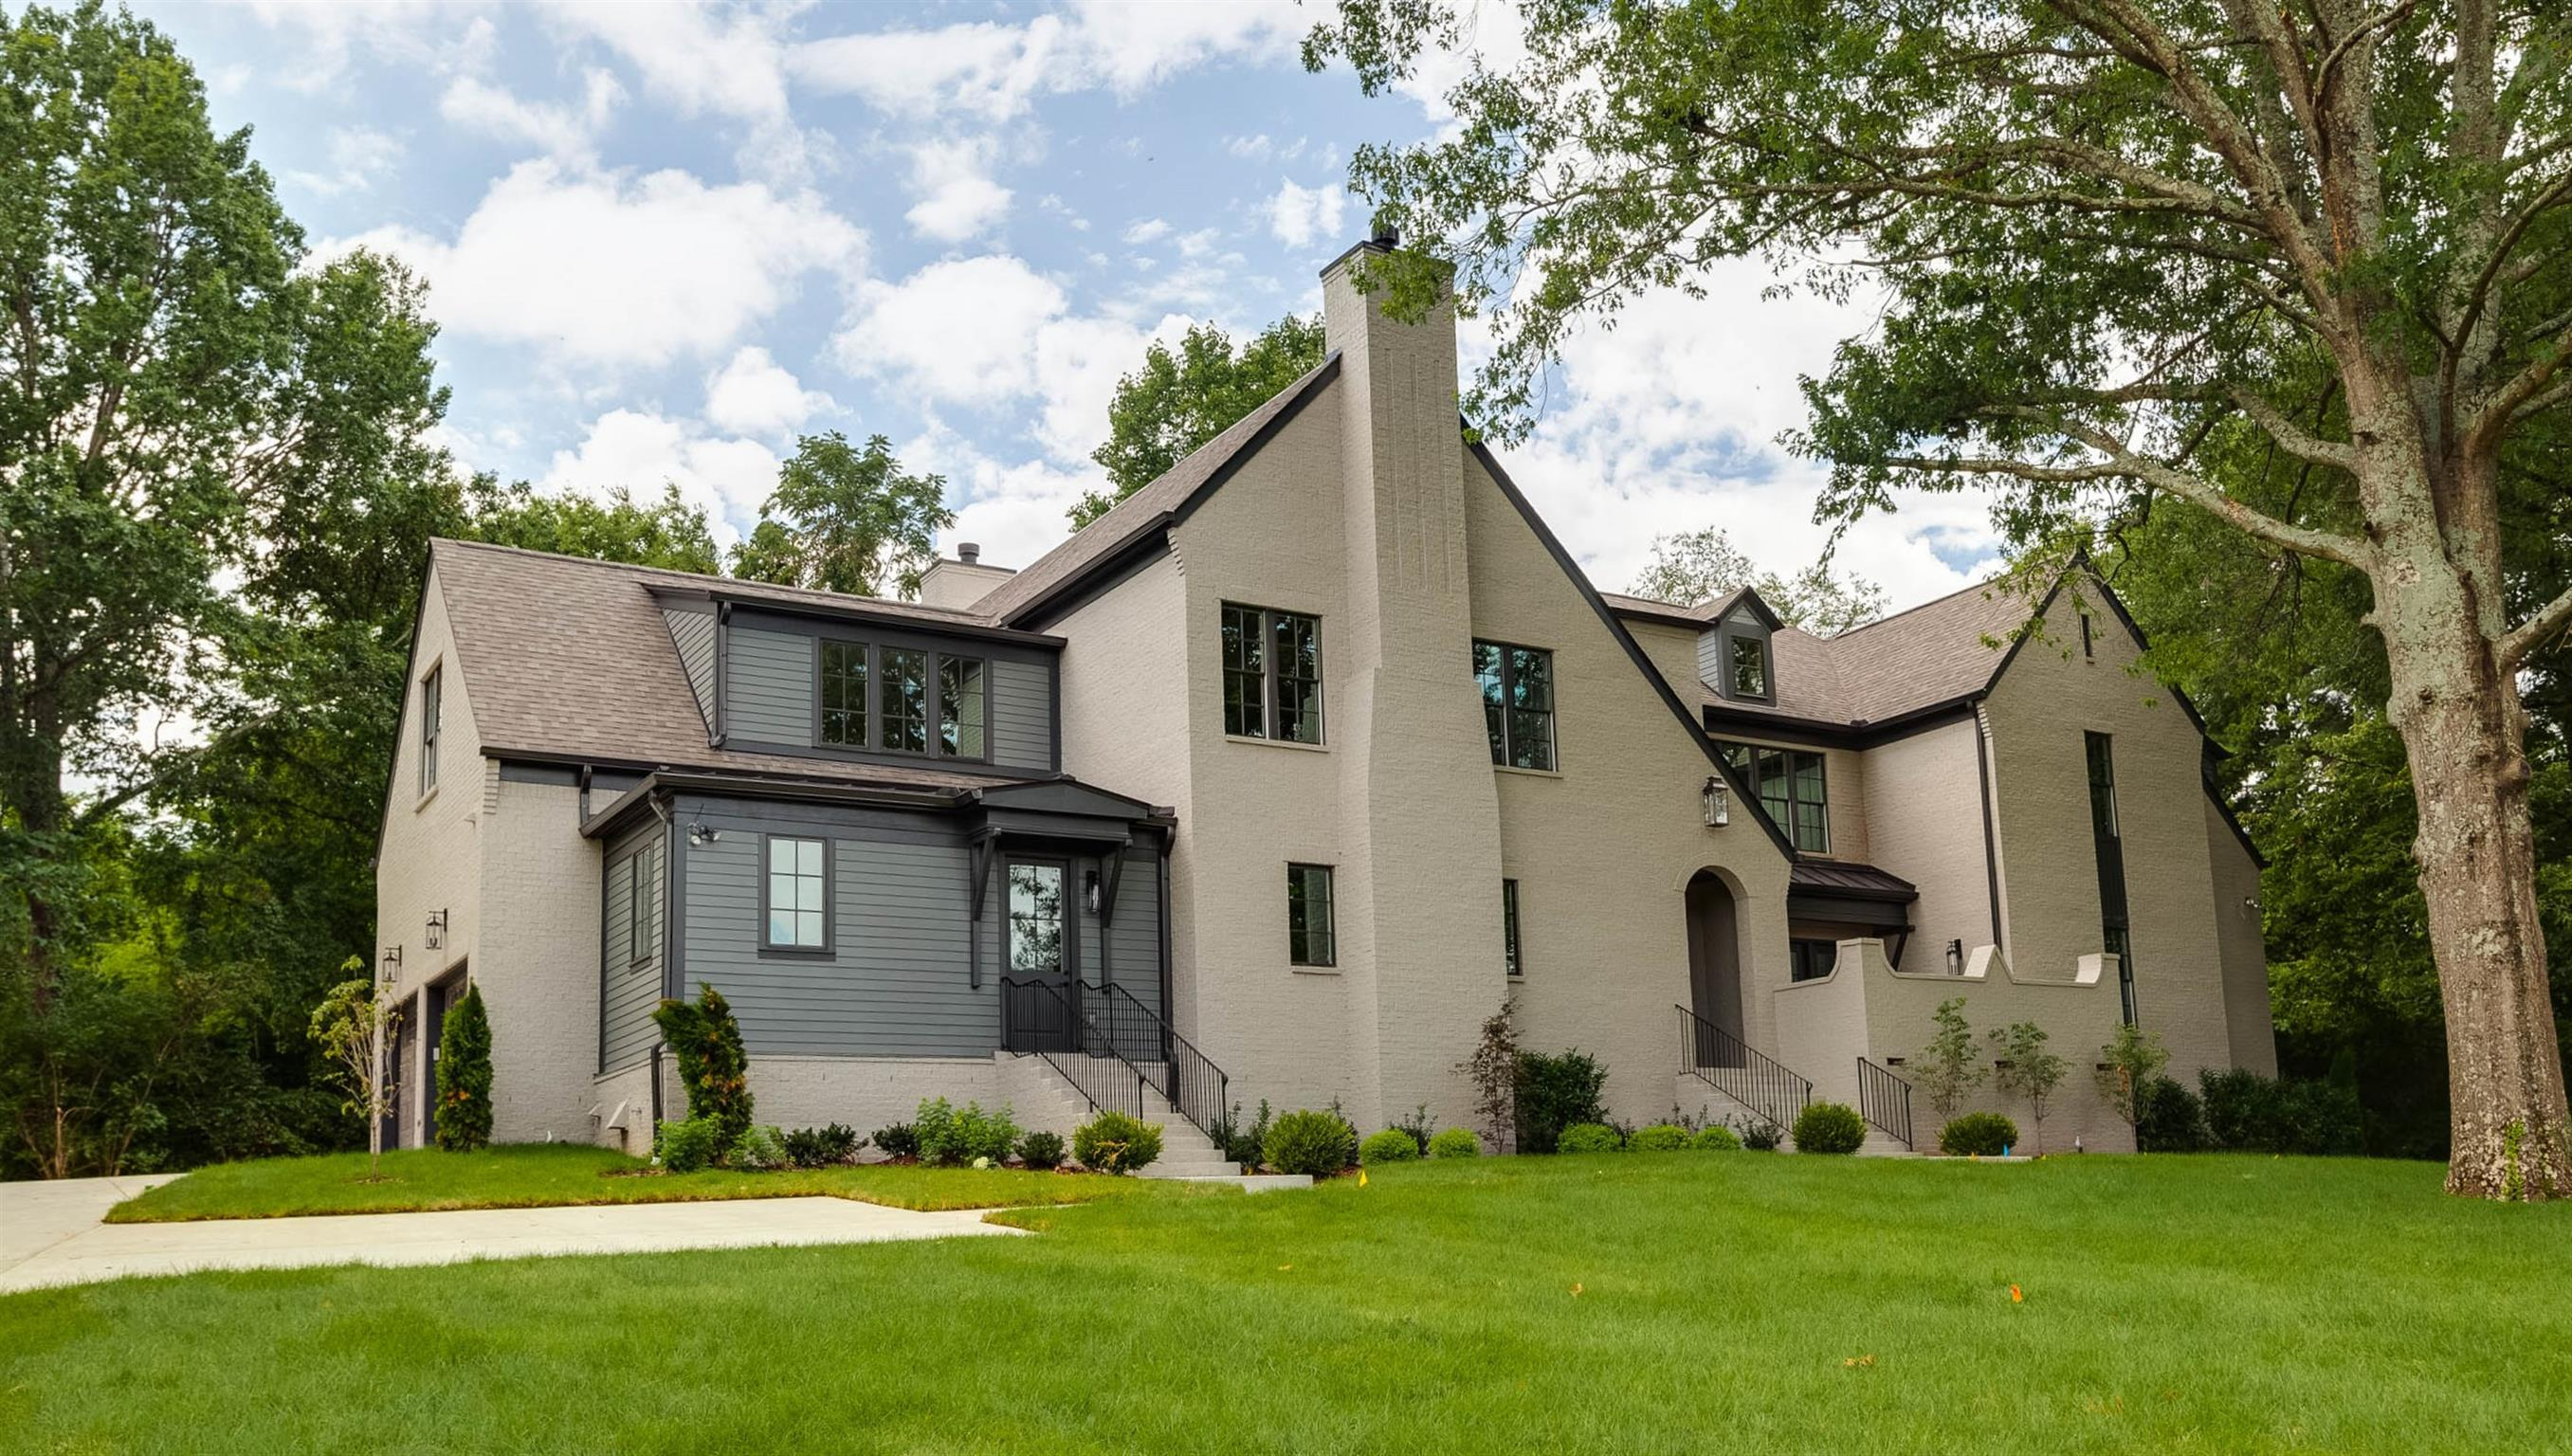 731 Omandale Drive, Nashville, TN 37204 - Nashville, TN real estate listing